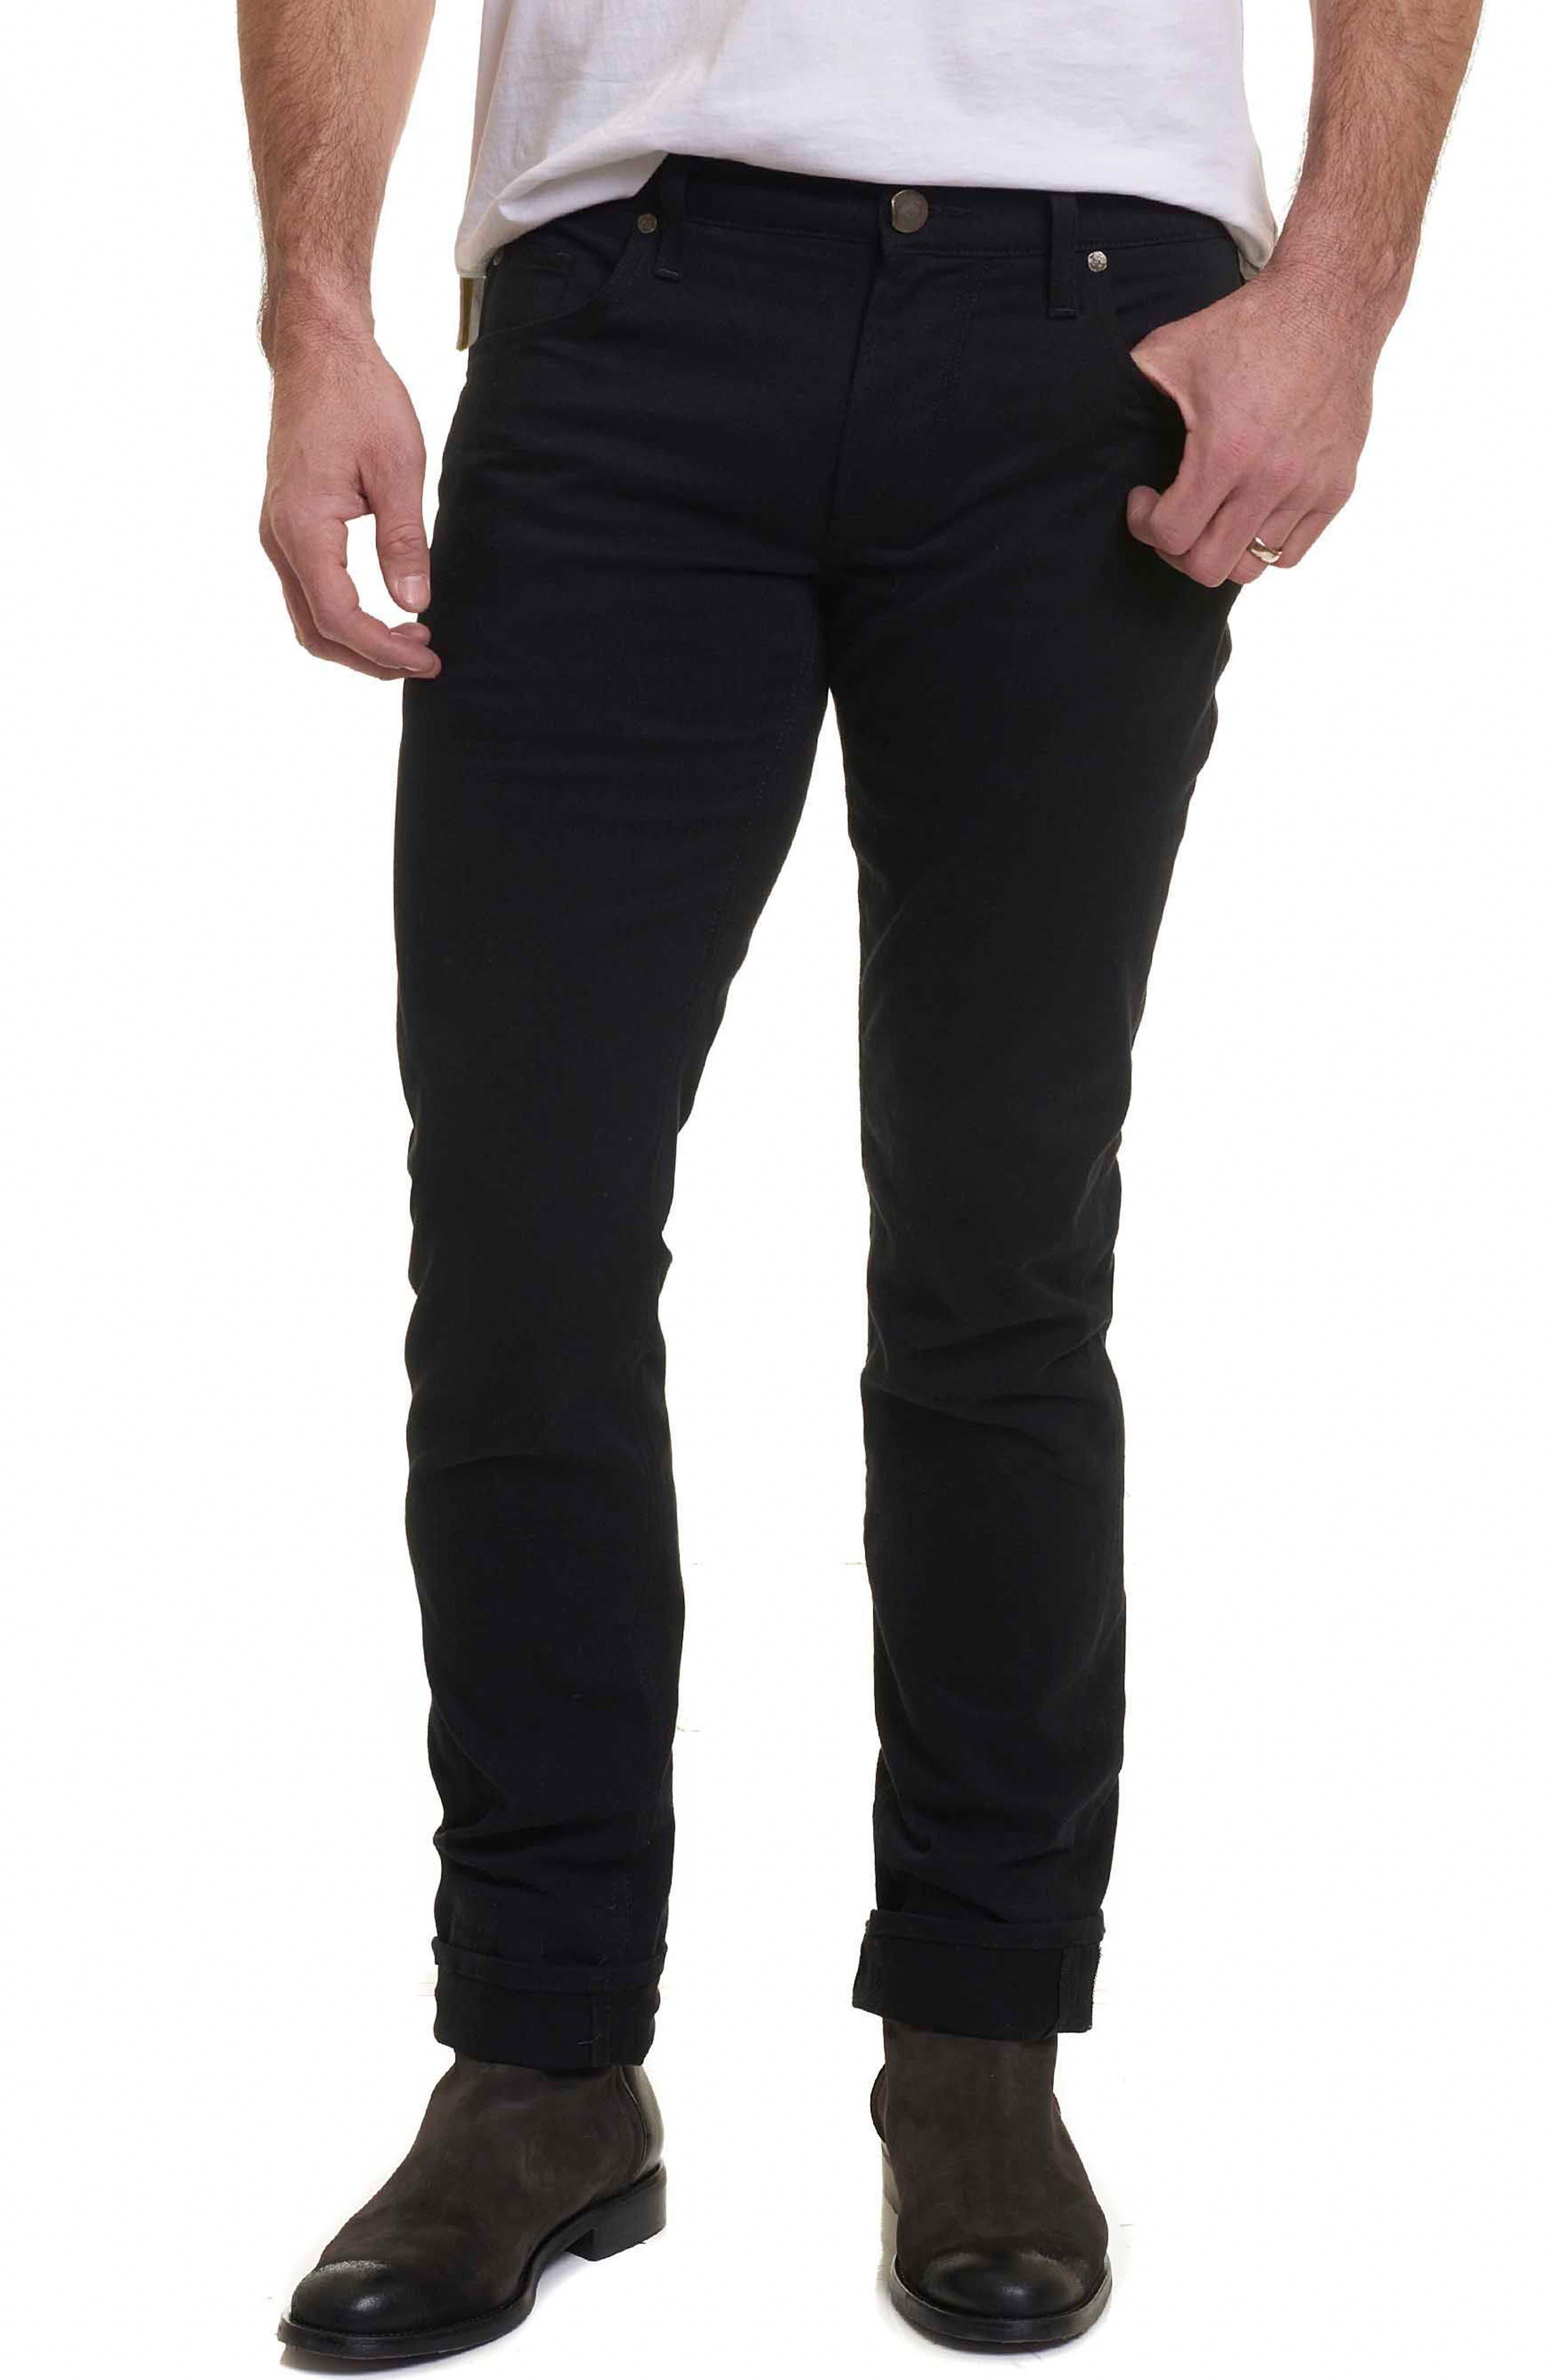 Alternate Image 1 Selected - Robert Graham Corwin Classic Fit Jeans